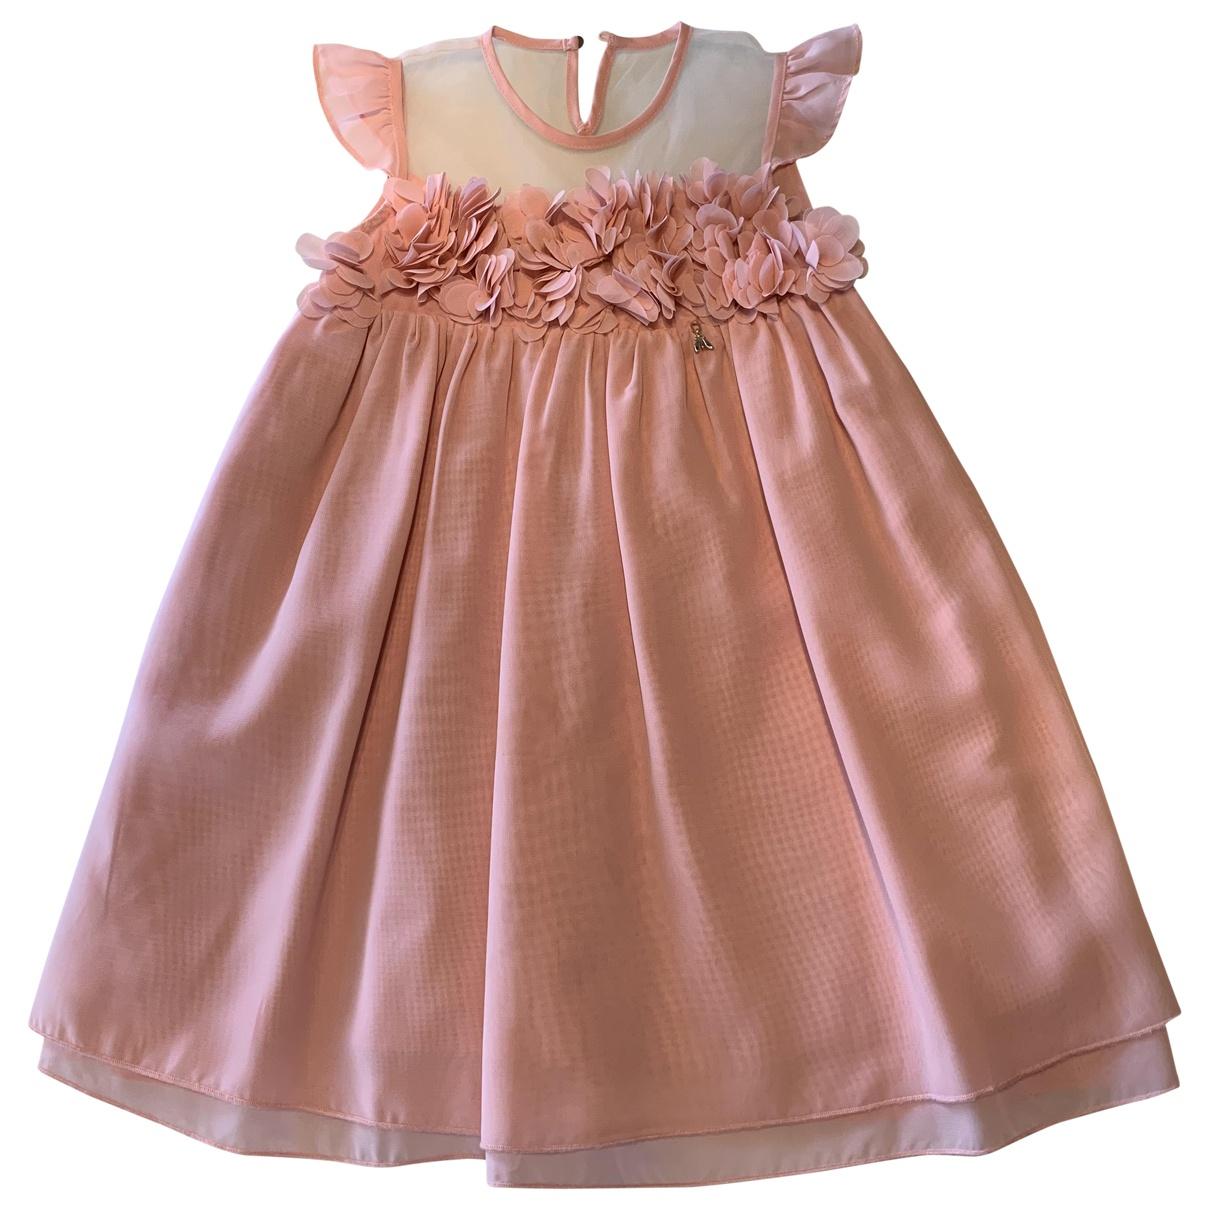 Patrizia Pepe \N Kleid in  Rosa Synthetik